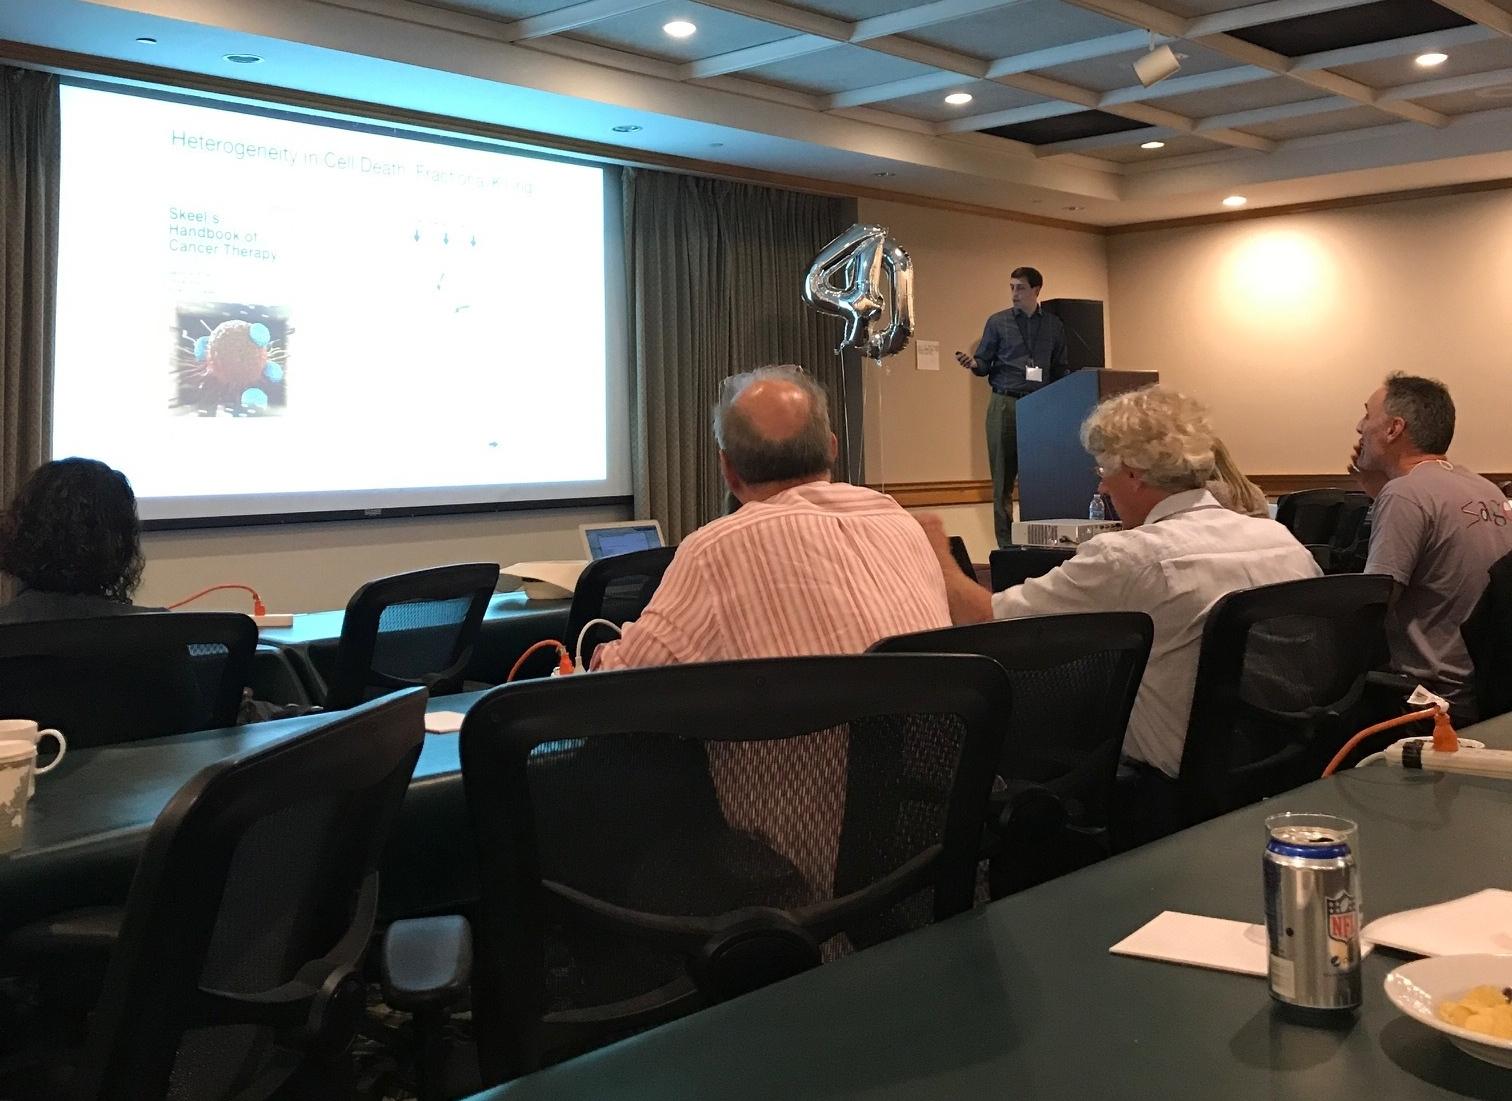 Zintis presents his work - Stanford Cancer Biology Retreat, San Jose, 16 Sep 17